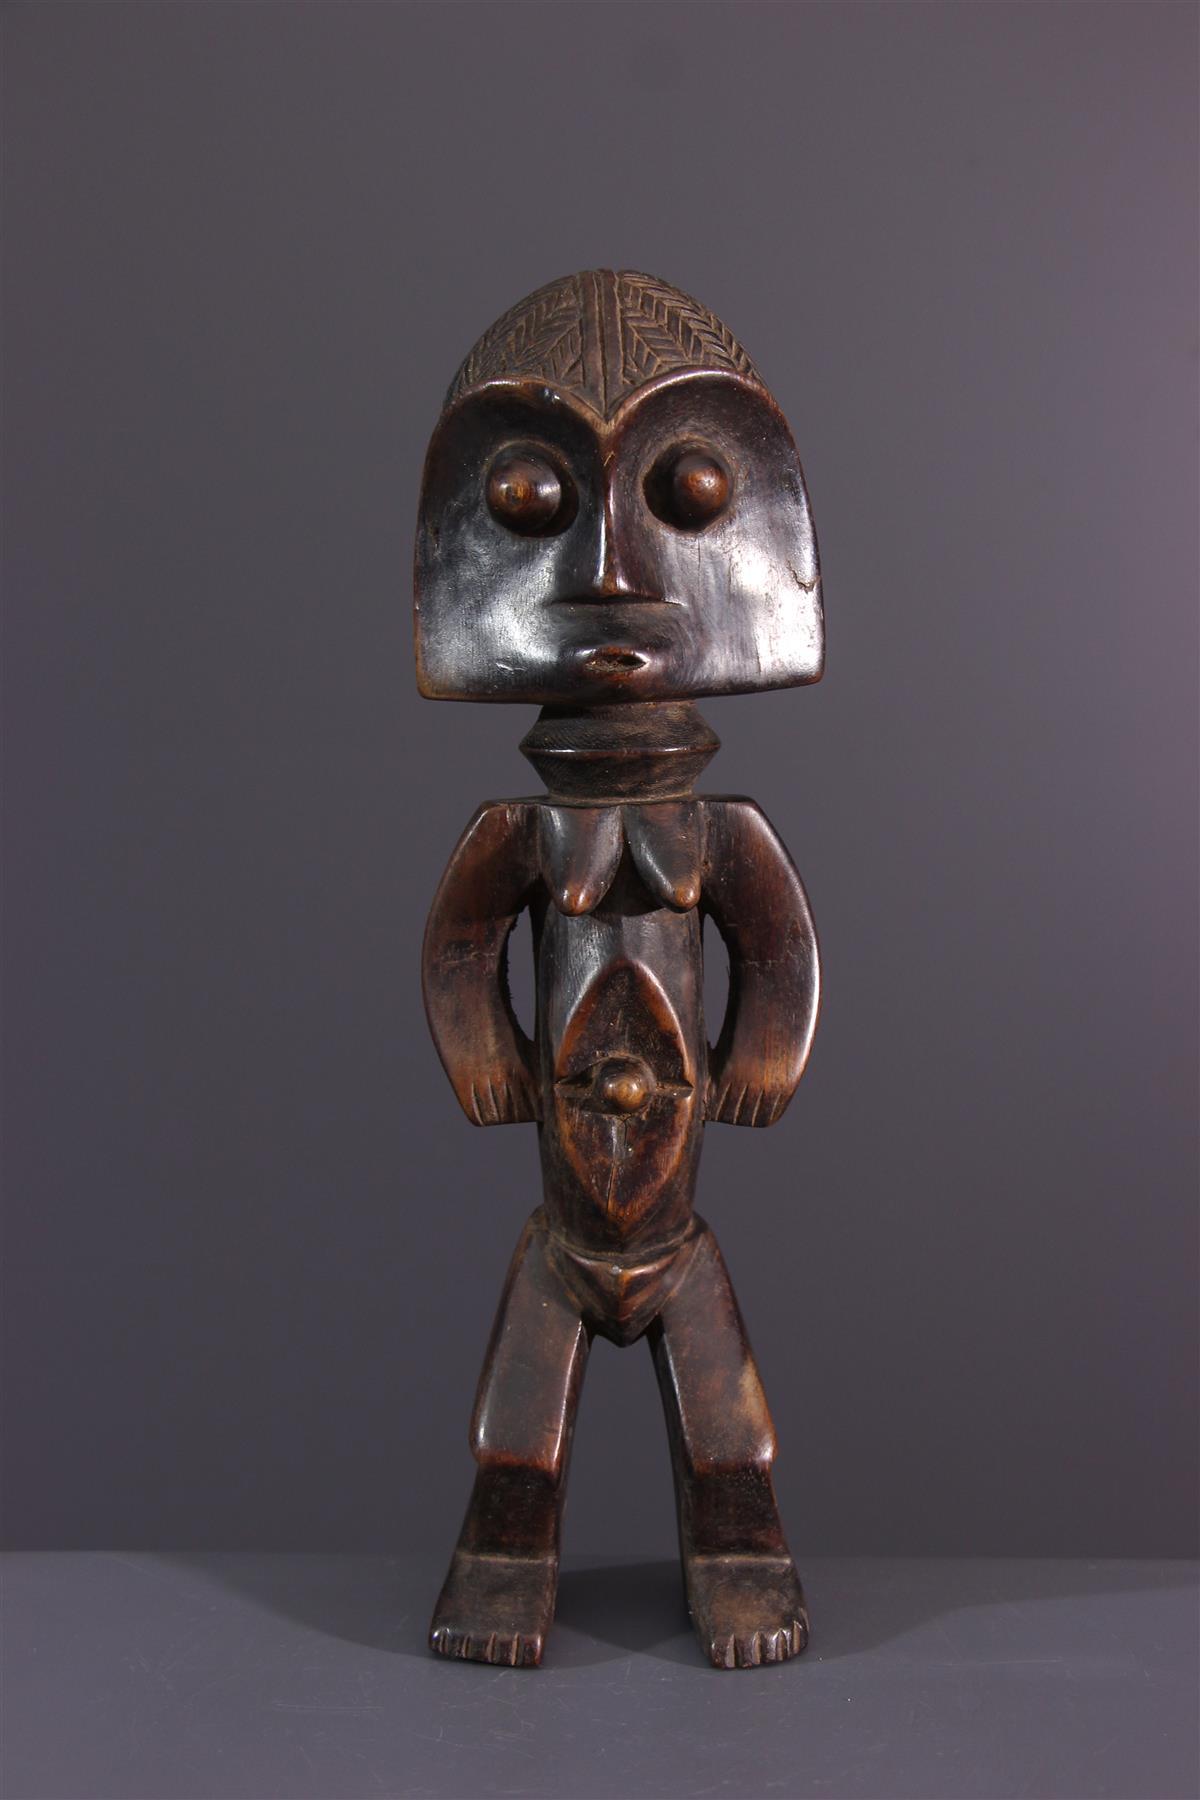 Statuette Ubangi - African art